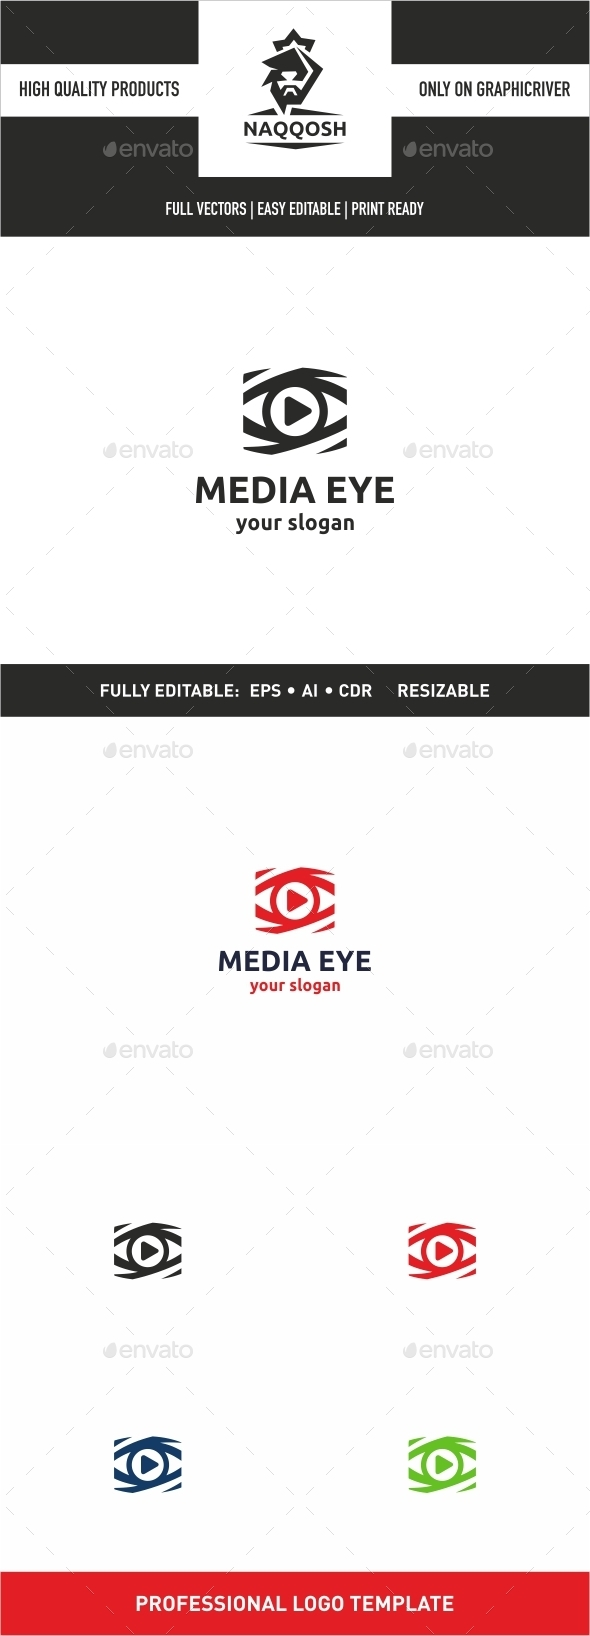 GraphicRiver Media Eye 10022746